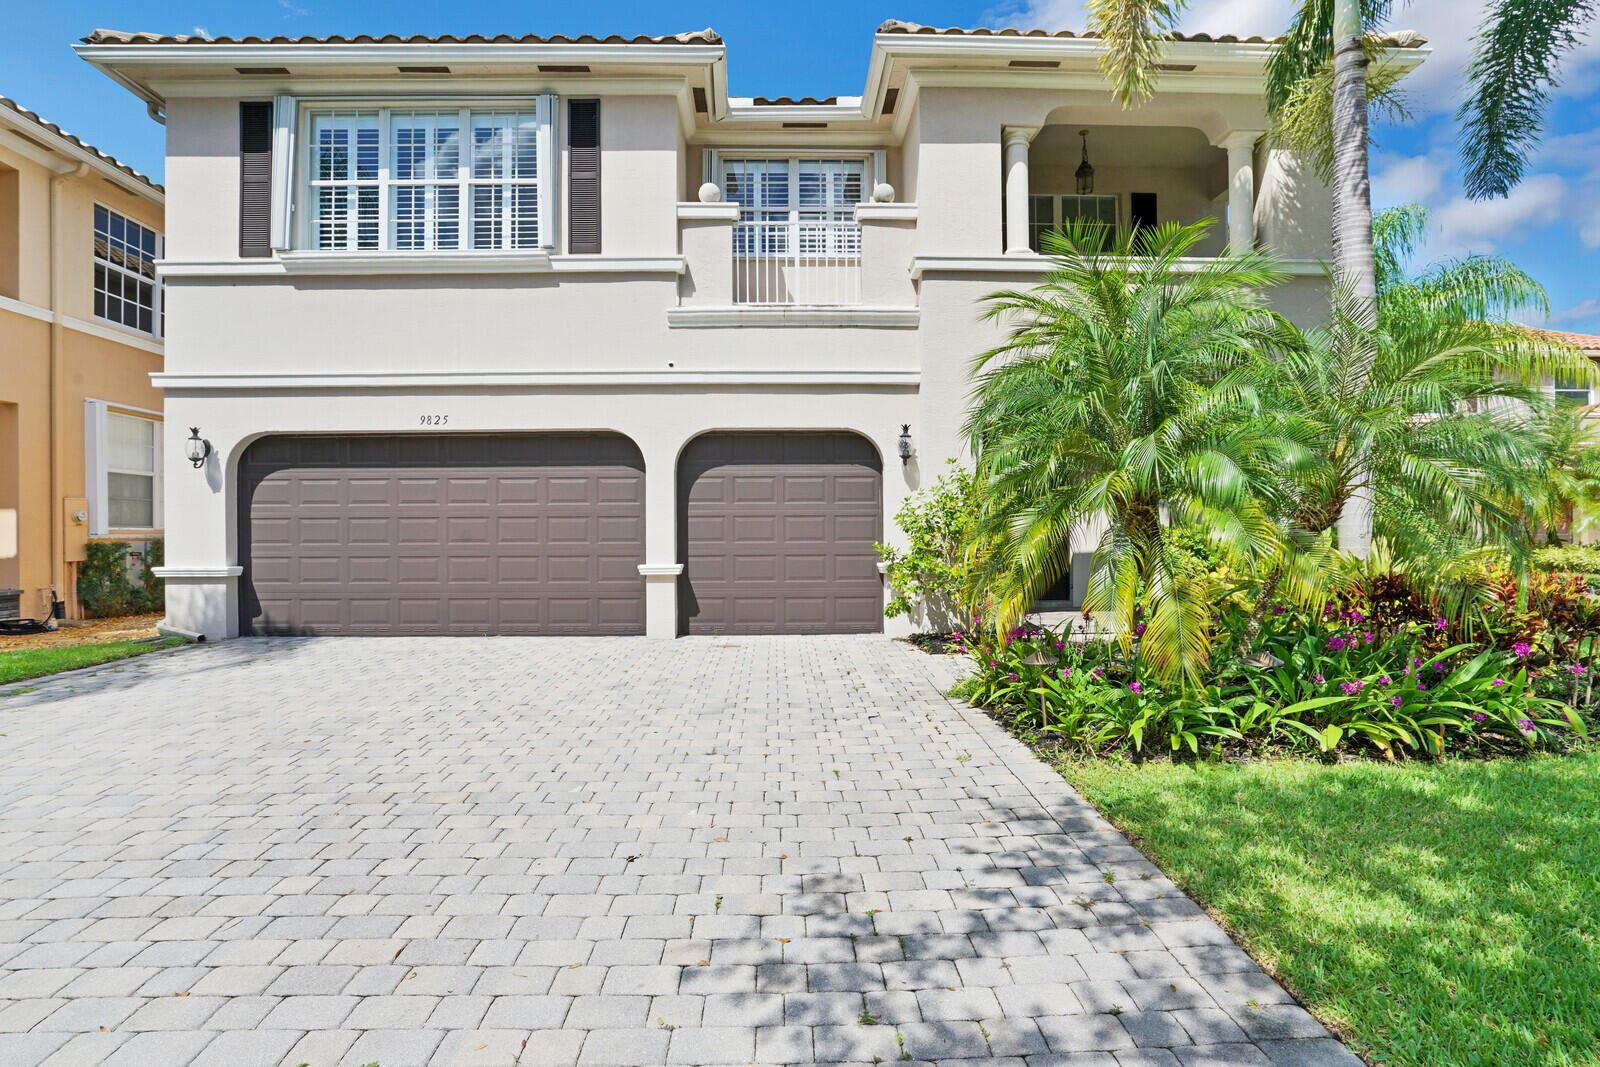 9825 Cobblestone Lakes Court, Boynton Beach, FL 33472 - MLS#: RX-10743377